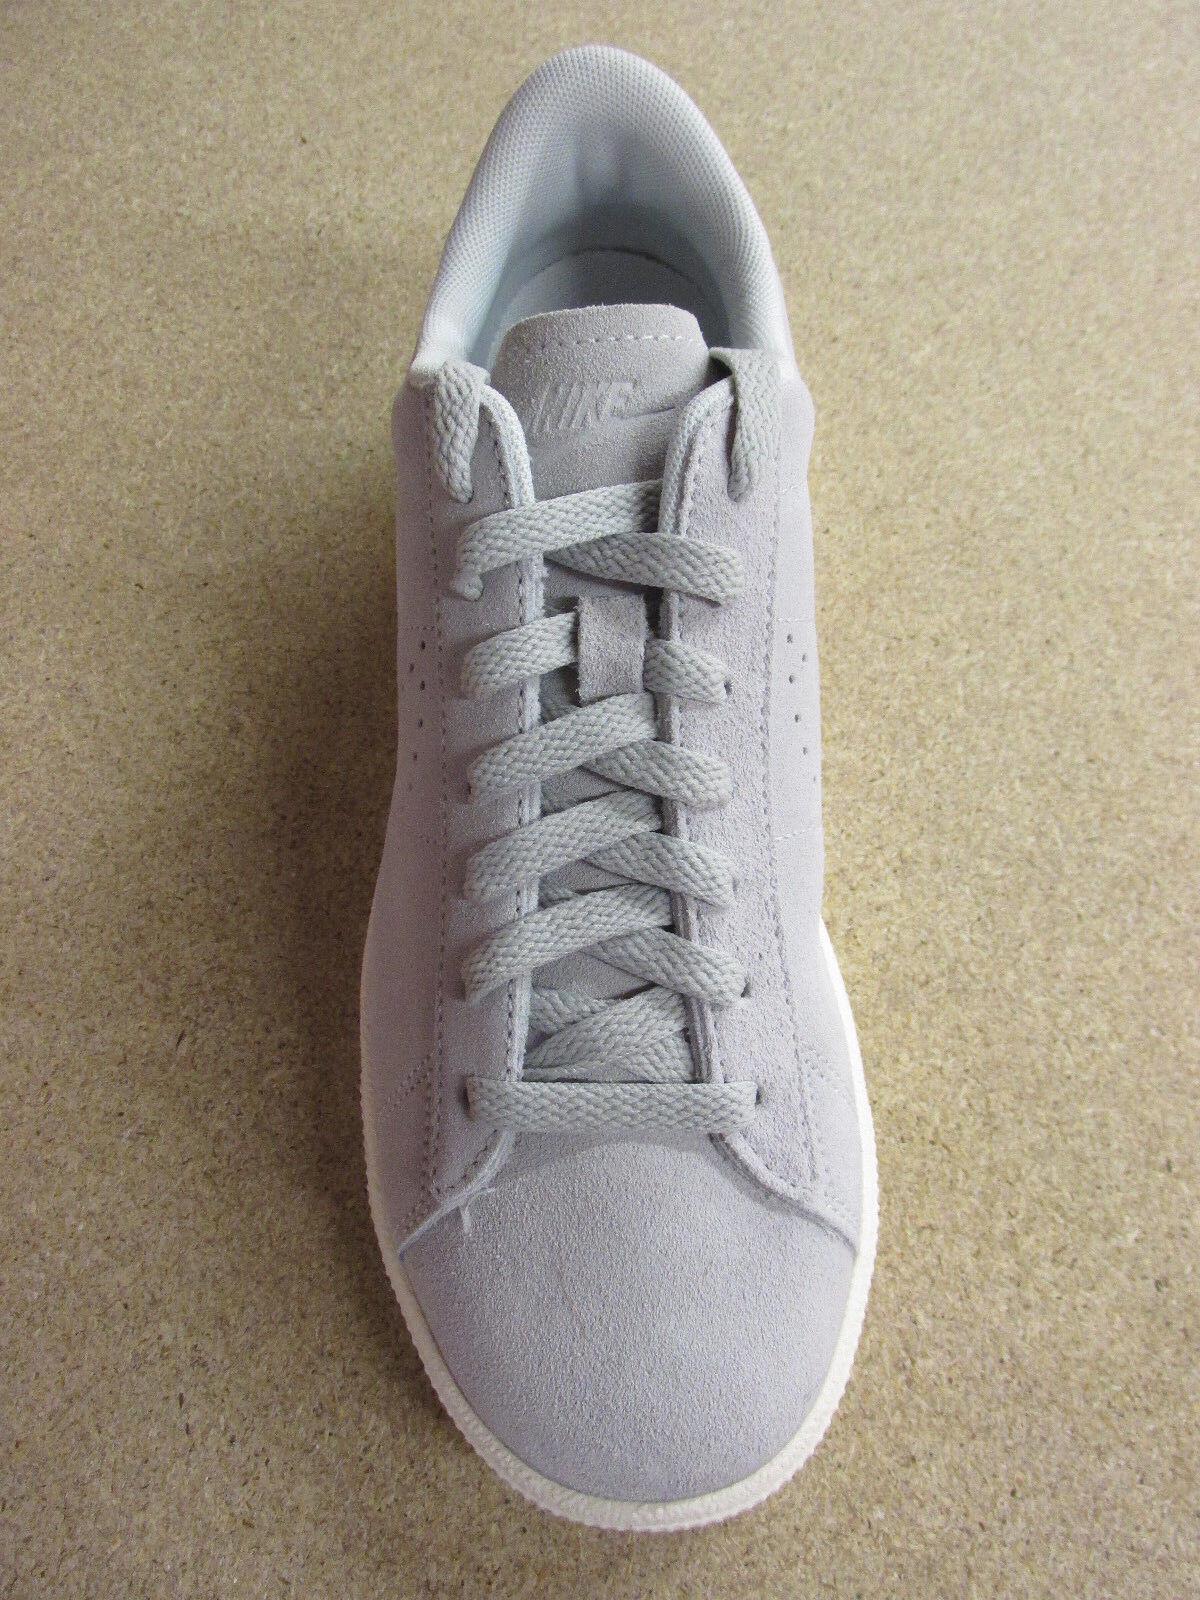 nike tennis mens classic cs wildleder - mens tennis trainer 829351 001 sneakers, schuhe 9d7f12